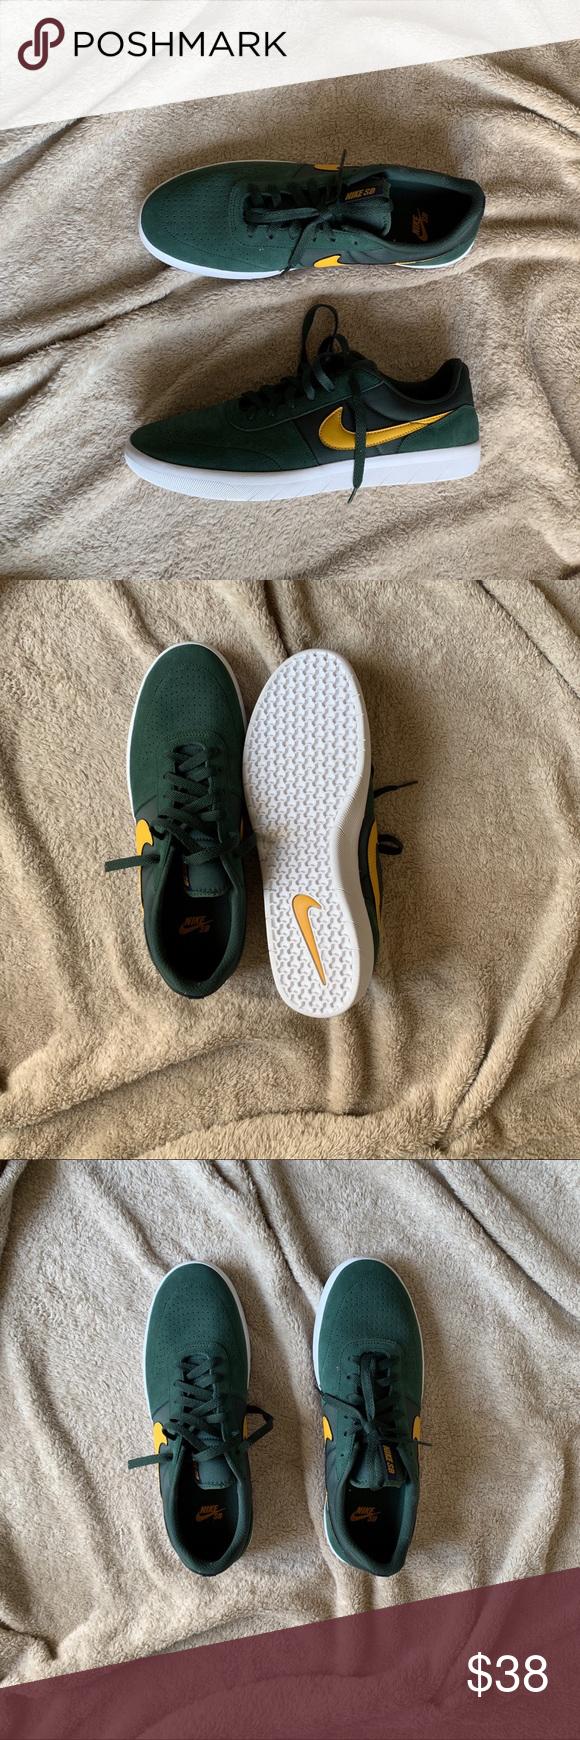 Skate Shoe | Skate shoes, Nike sb